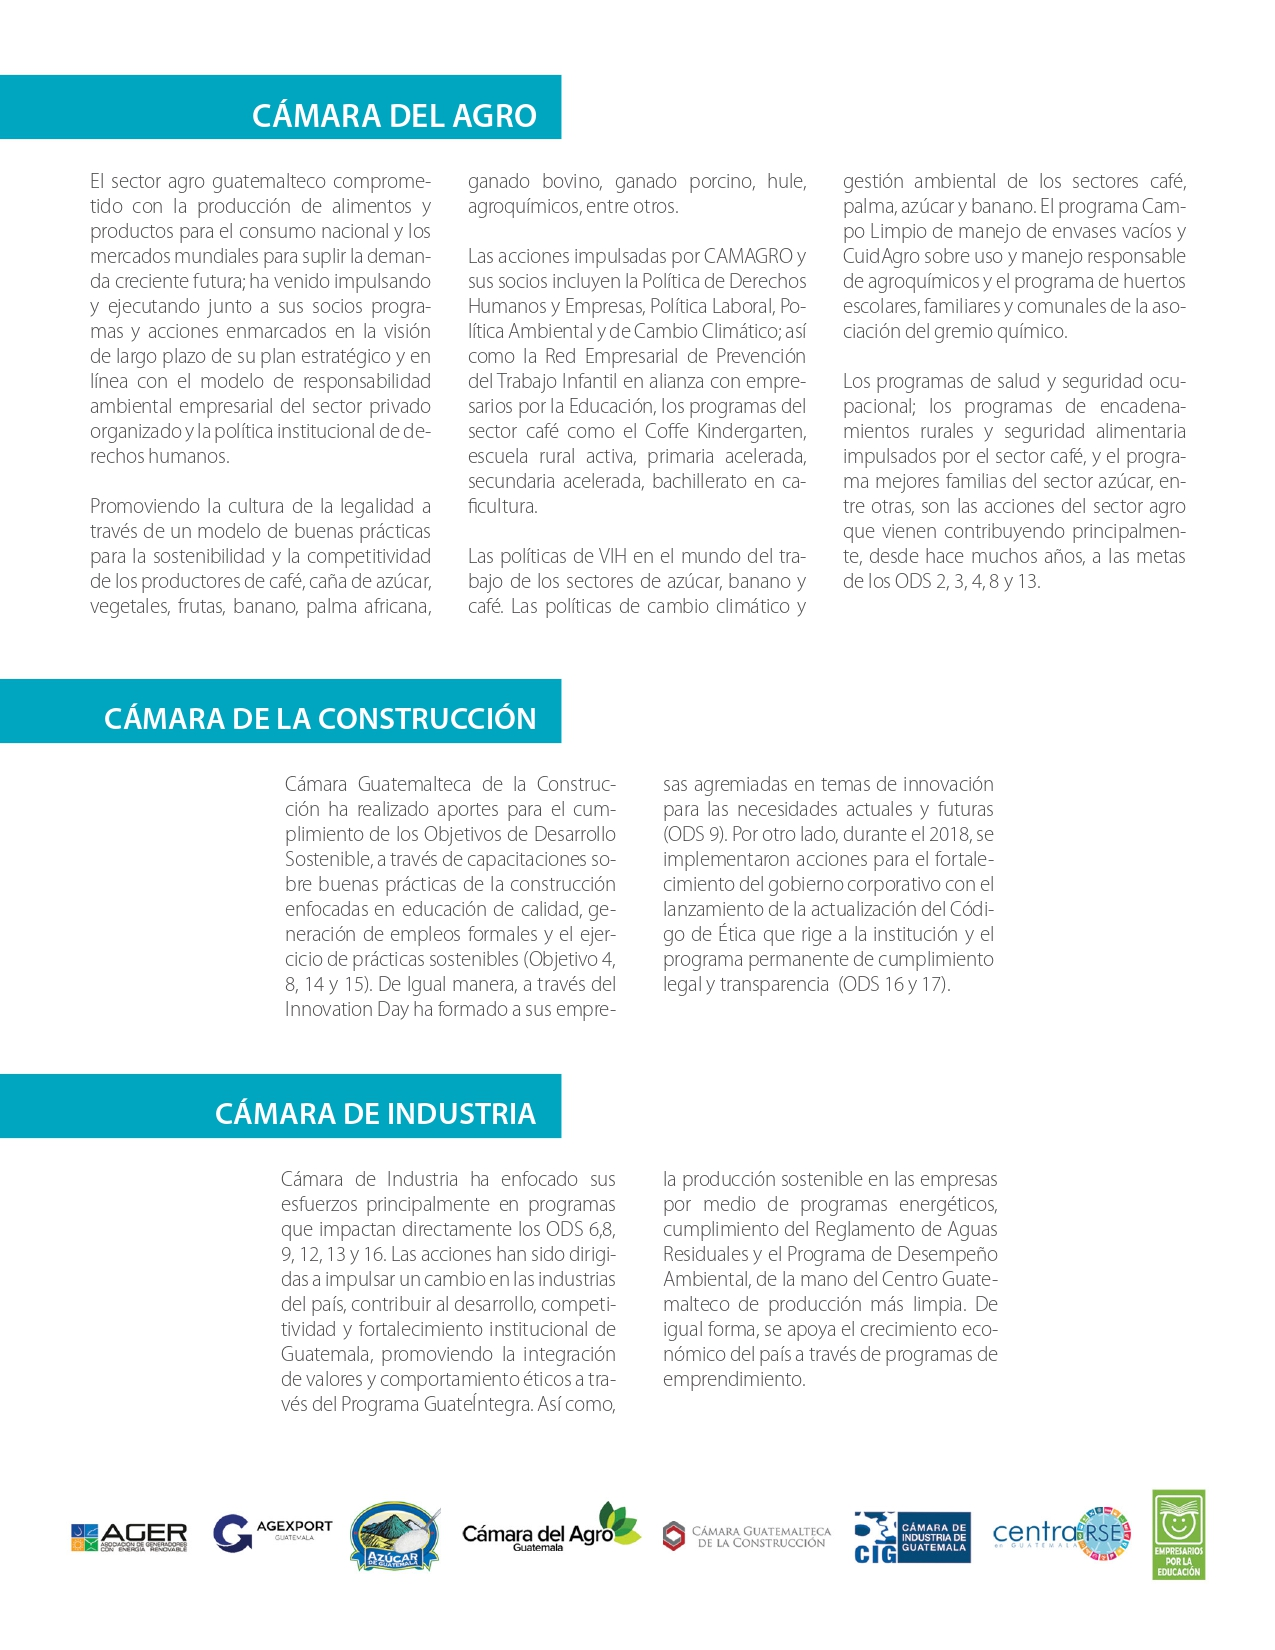 RESUMEN EJECUTIVO-2 (1)_page-0003.jpg